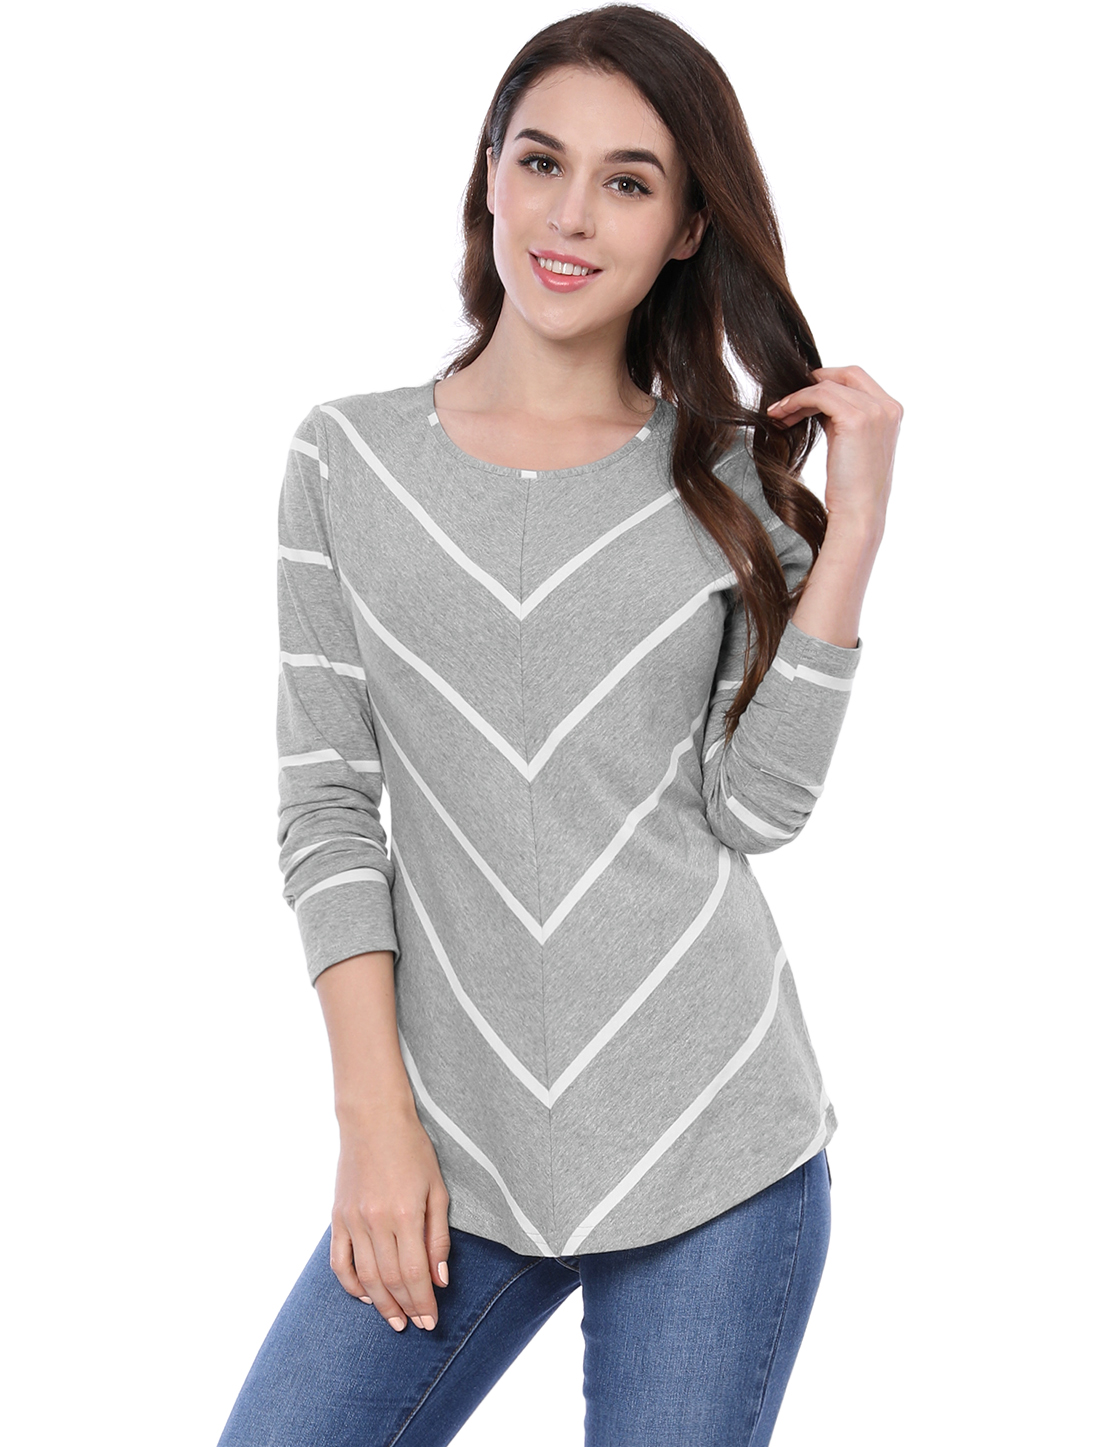 Women Long Sleeves Scoop Neck Striped Chevron Print Top Gray XL